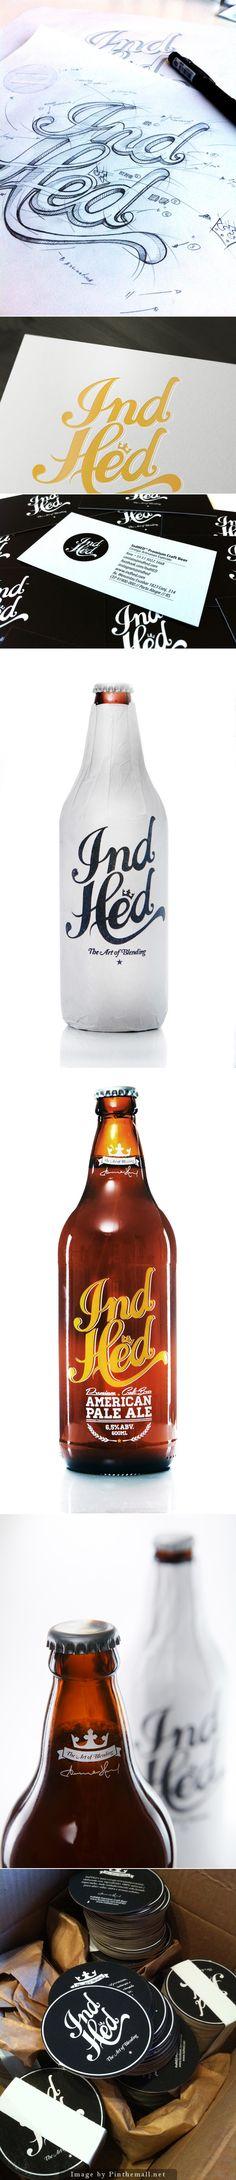 #branding #design #packaging #identity - created on 2014-09-04 18:40:04